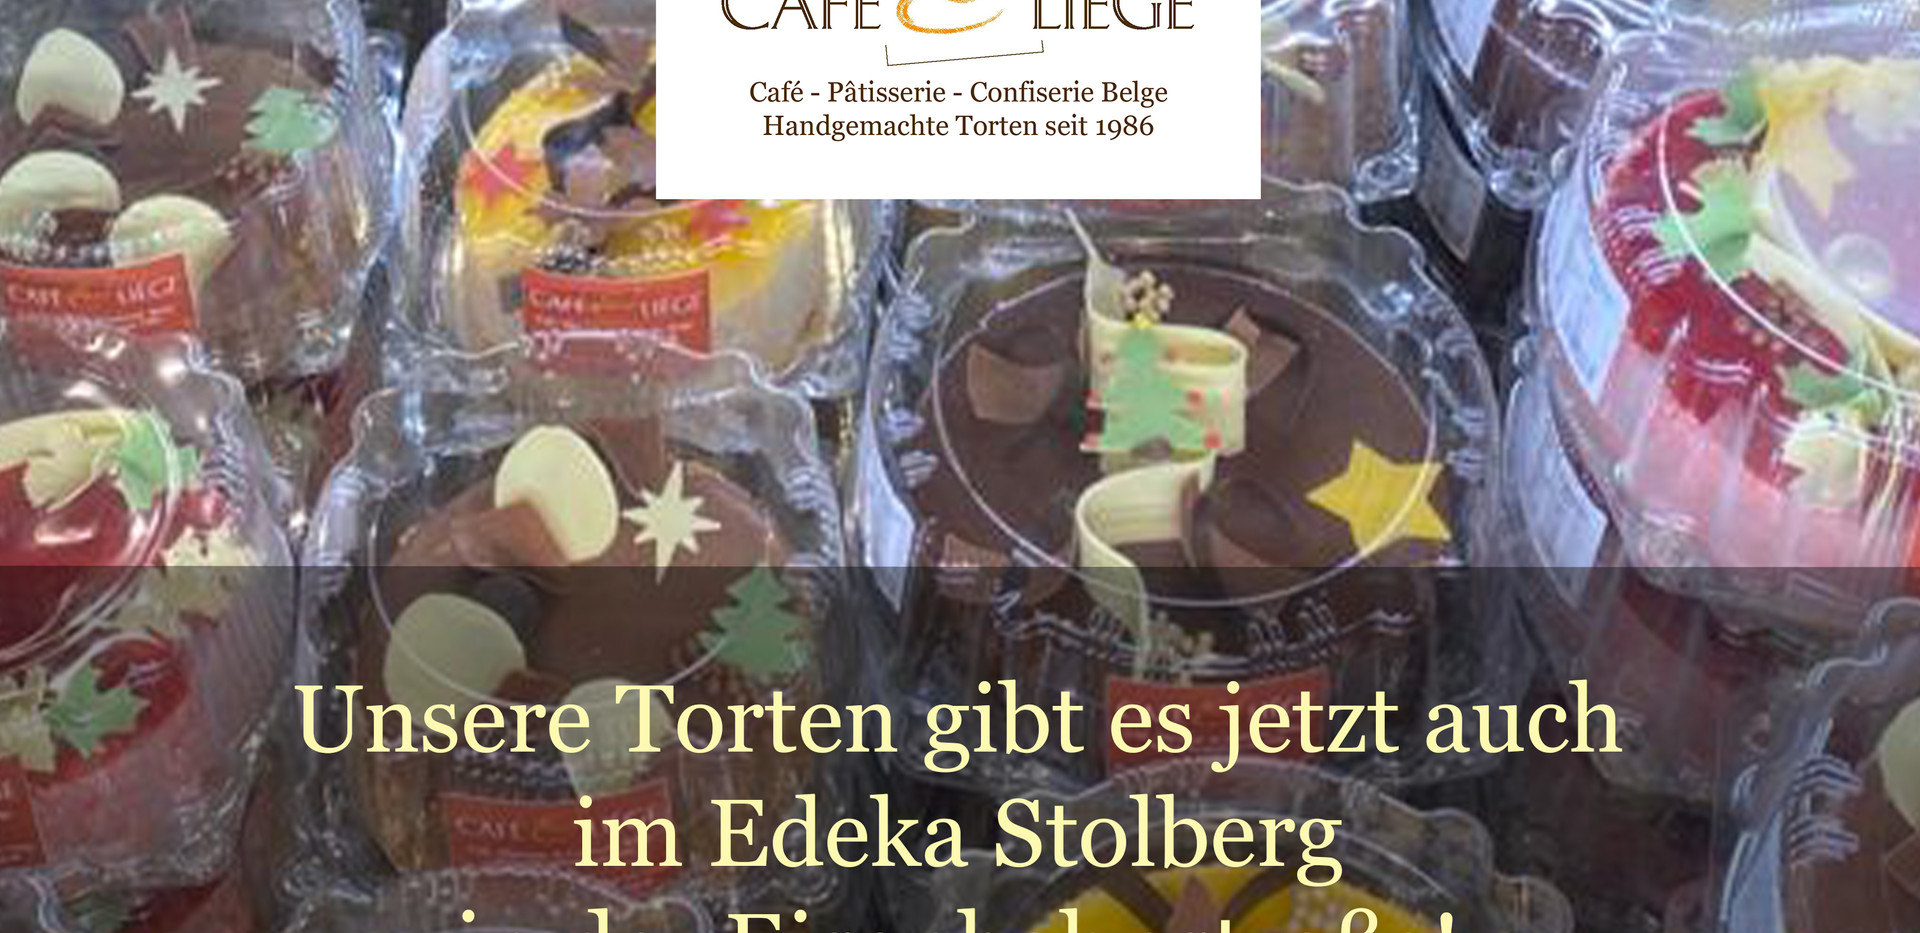 edeka stolberg.jpg